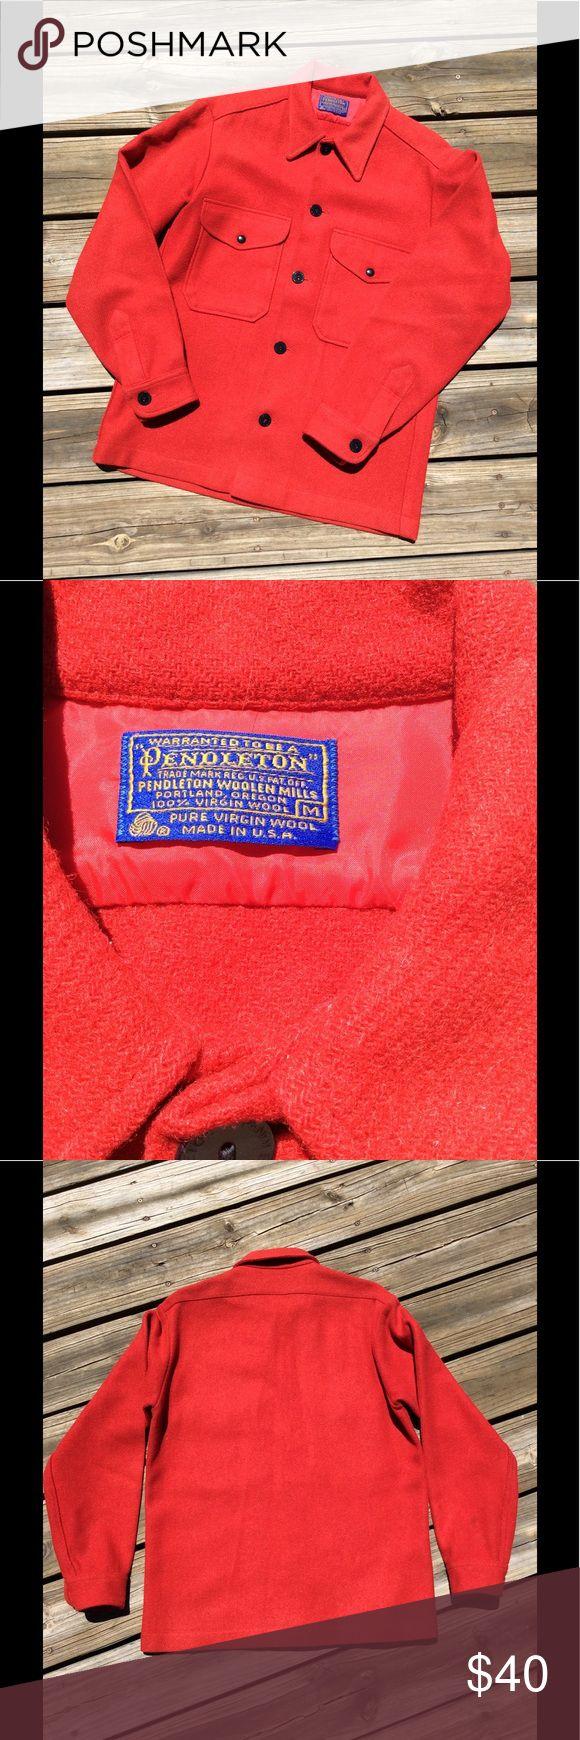 "Vintage Pendleton shirt jacket Medium red wool Red medium Vintage Pendleton shirt jacket. One small spot very hard to see on sleeve.  See picture.  Armpit to armpit 22.5"",  shoulder to shoulder 19"",  sleeve 24"" men/women Pendleton Shirts"